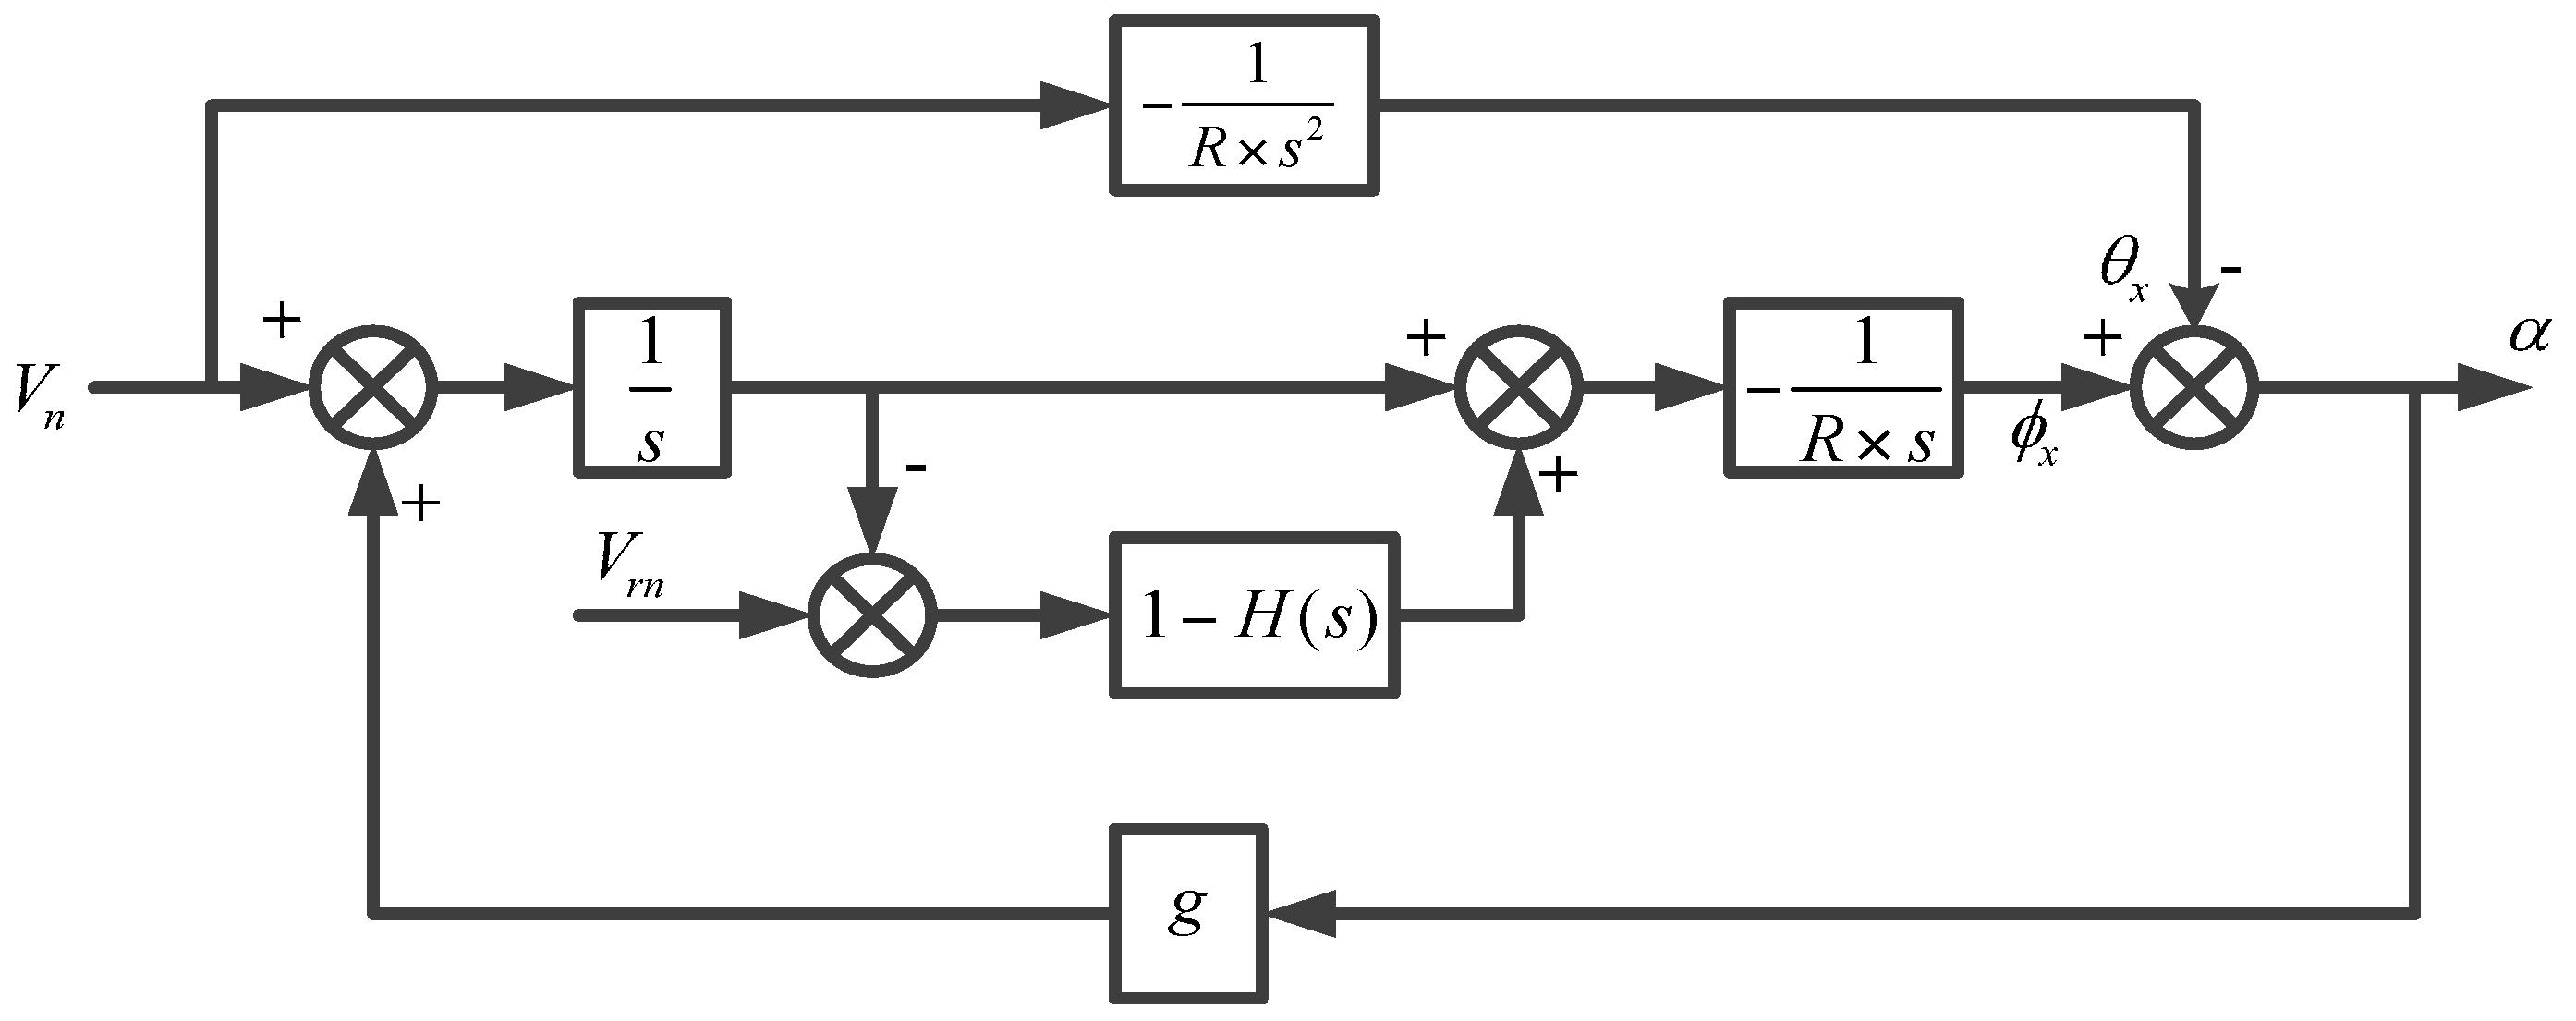 fiber optic block diagram